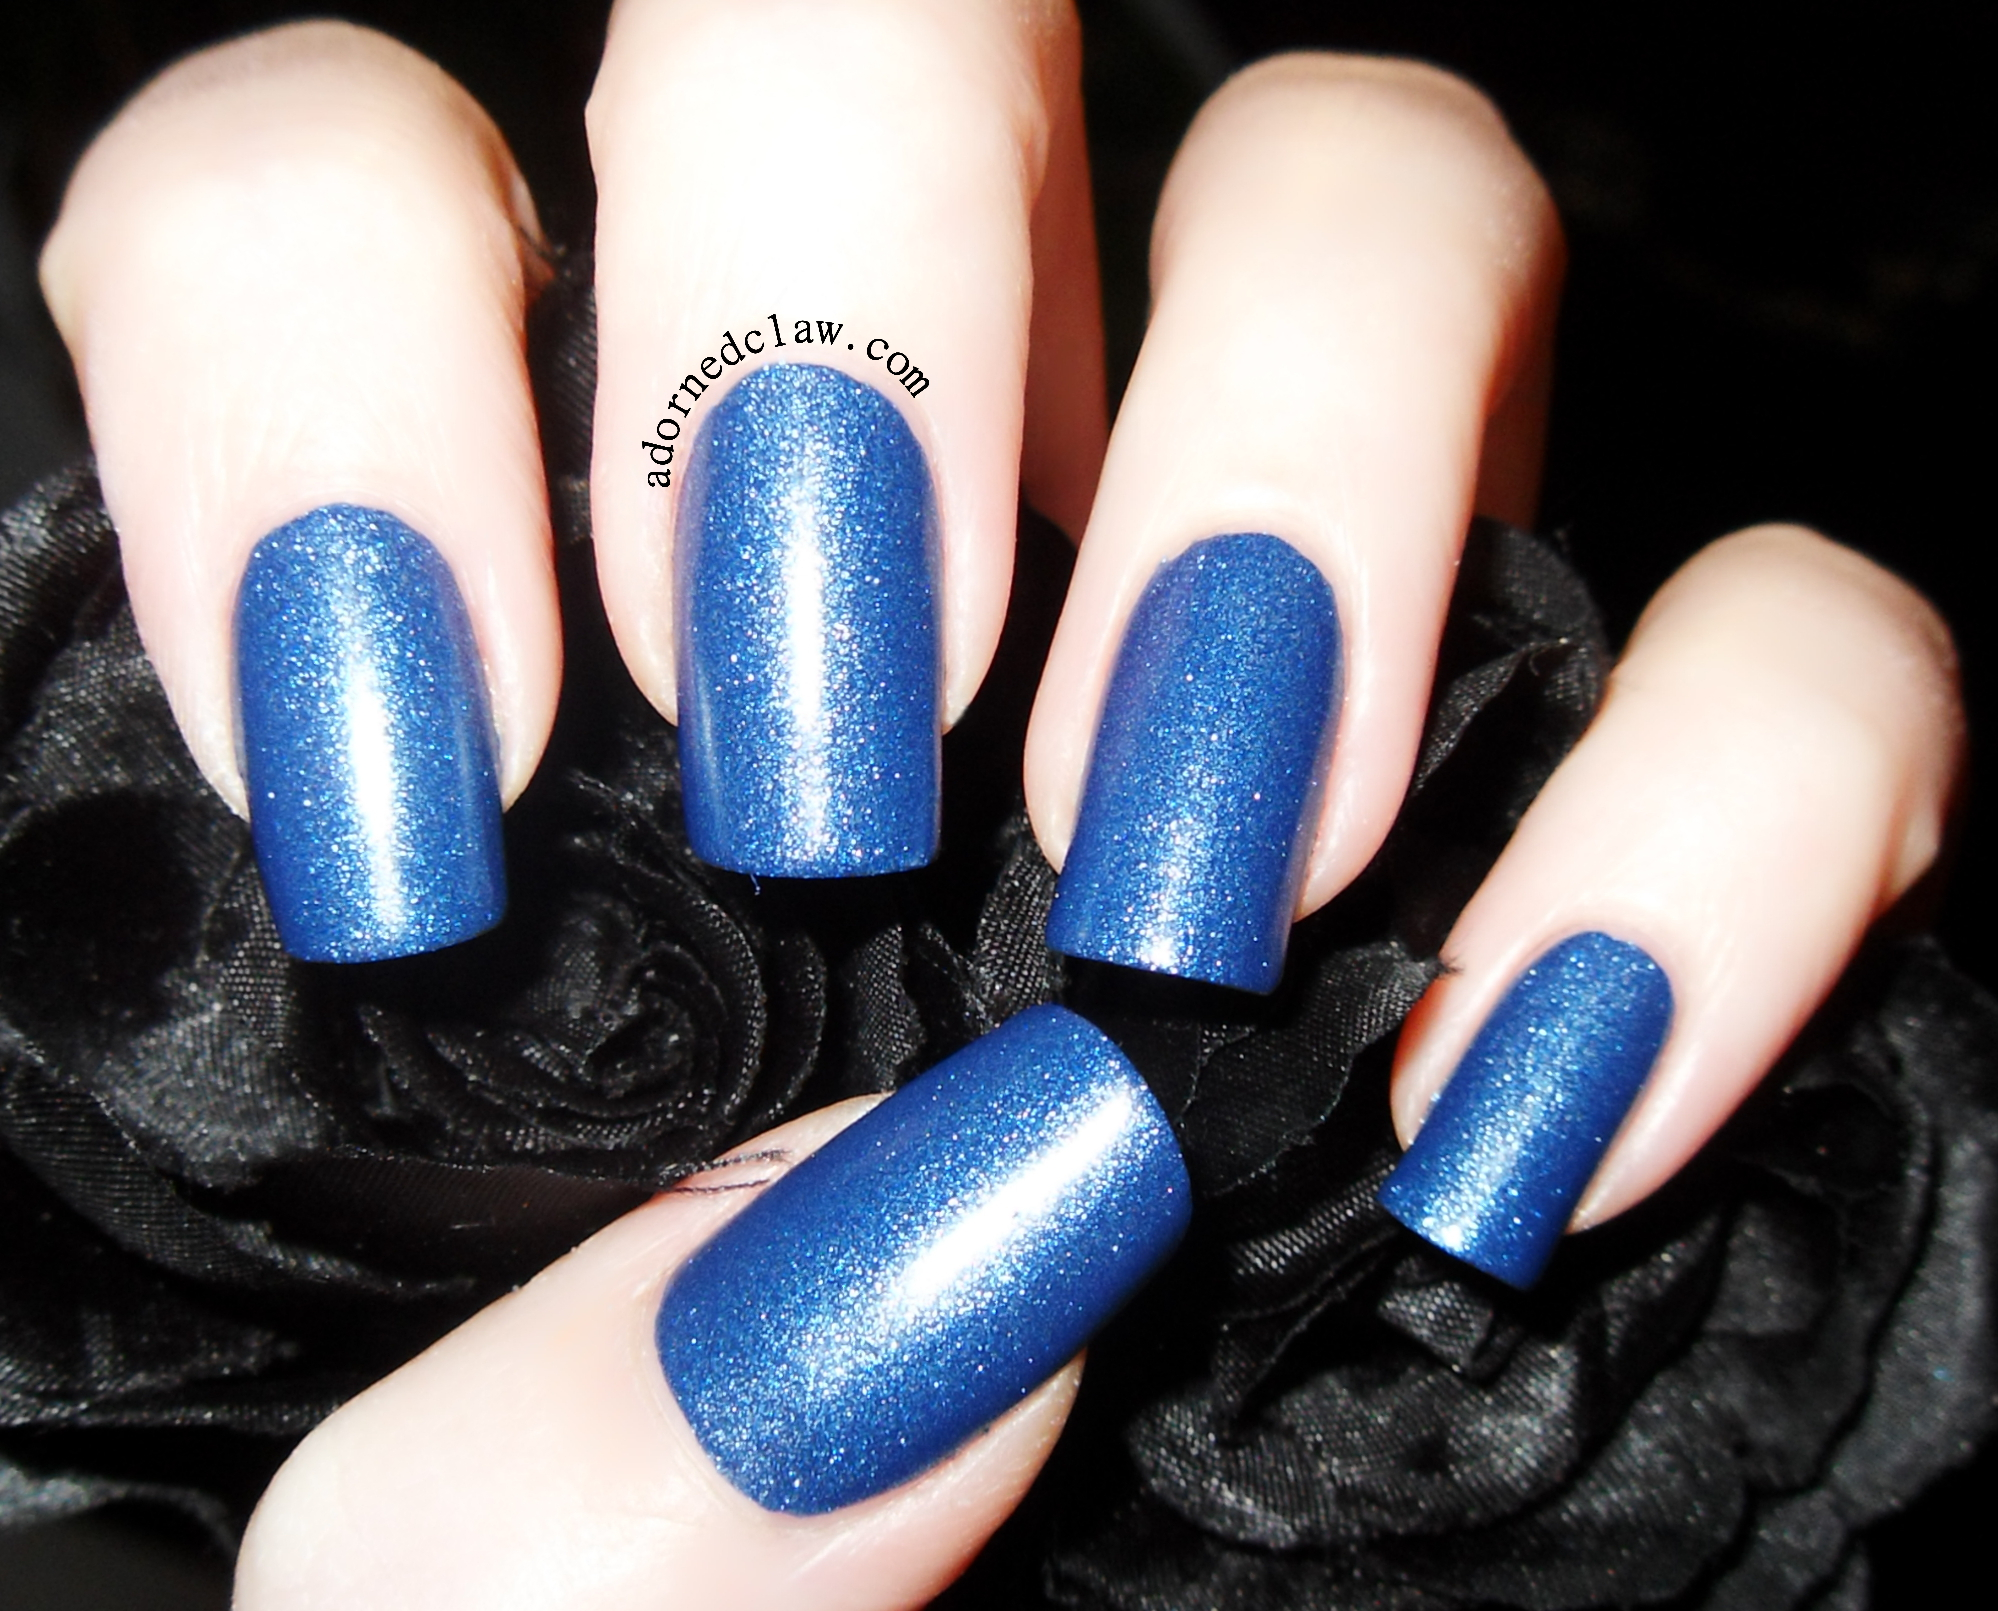 Nail Polish From Japan – Canmake Colorful Nails, Denim!   The ...